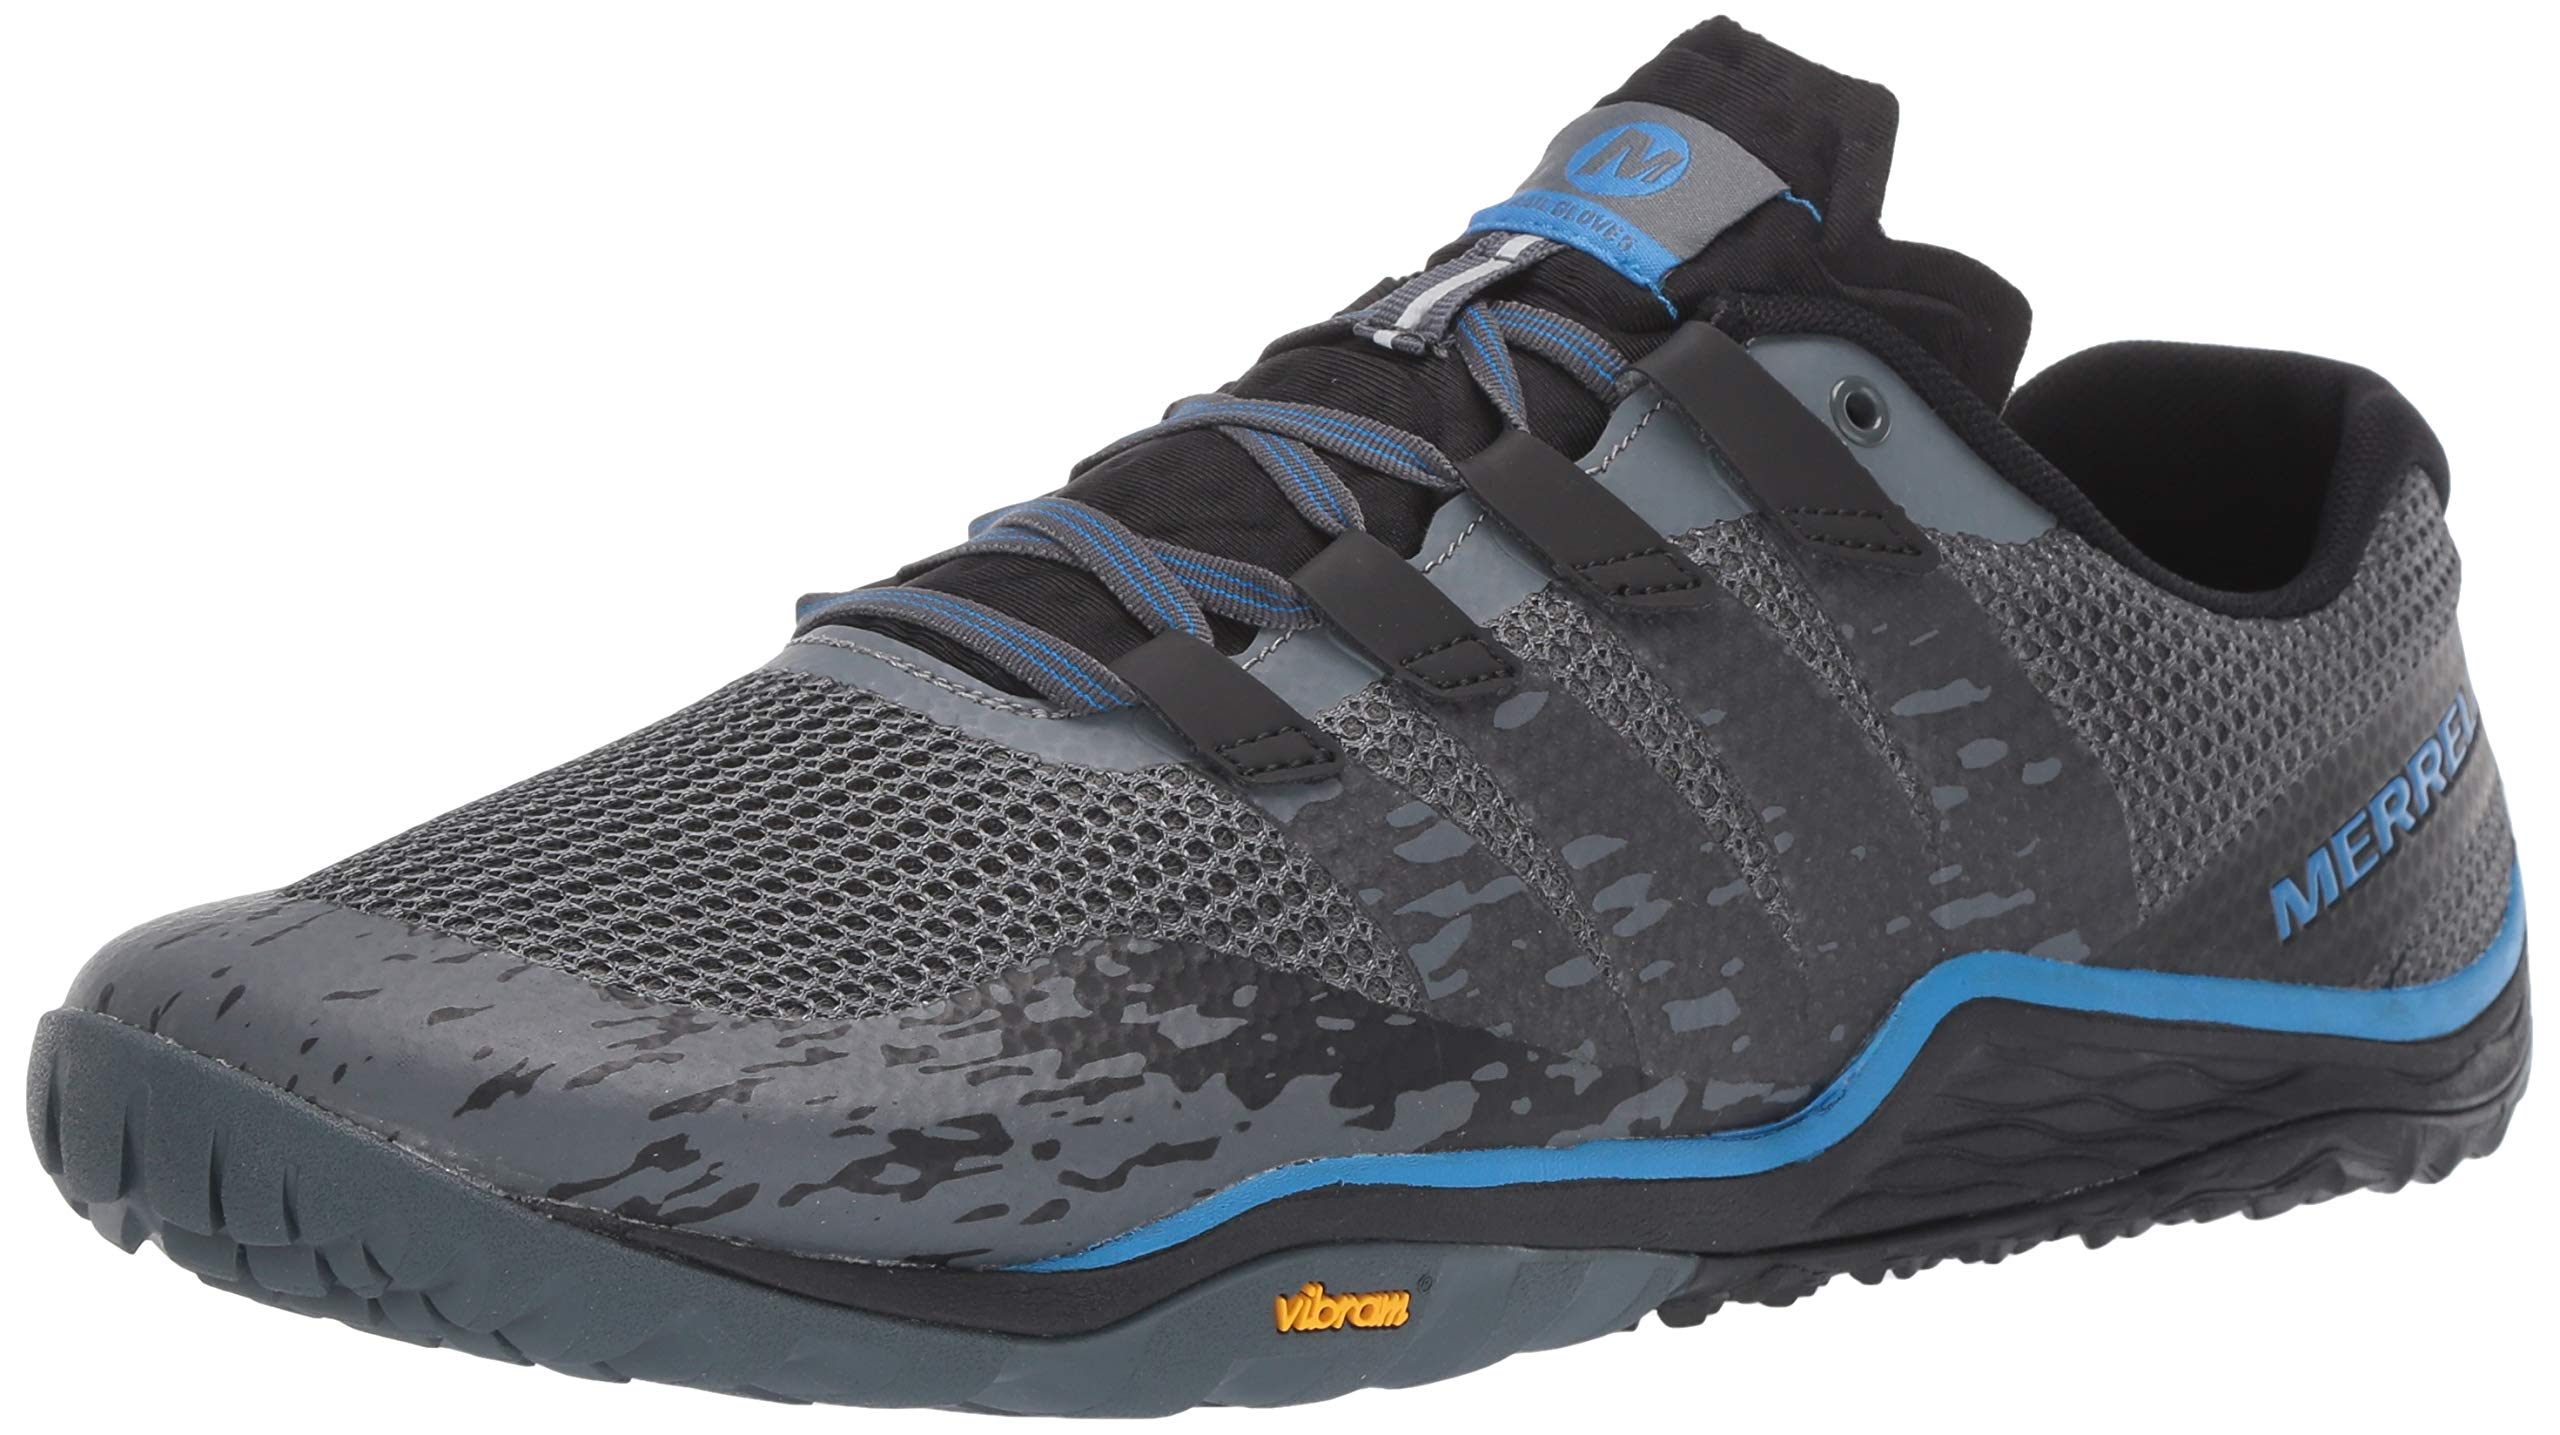 Merrell Men's Trail Glove 5 Sneaker, Turbulence, 07.0 M US